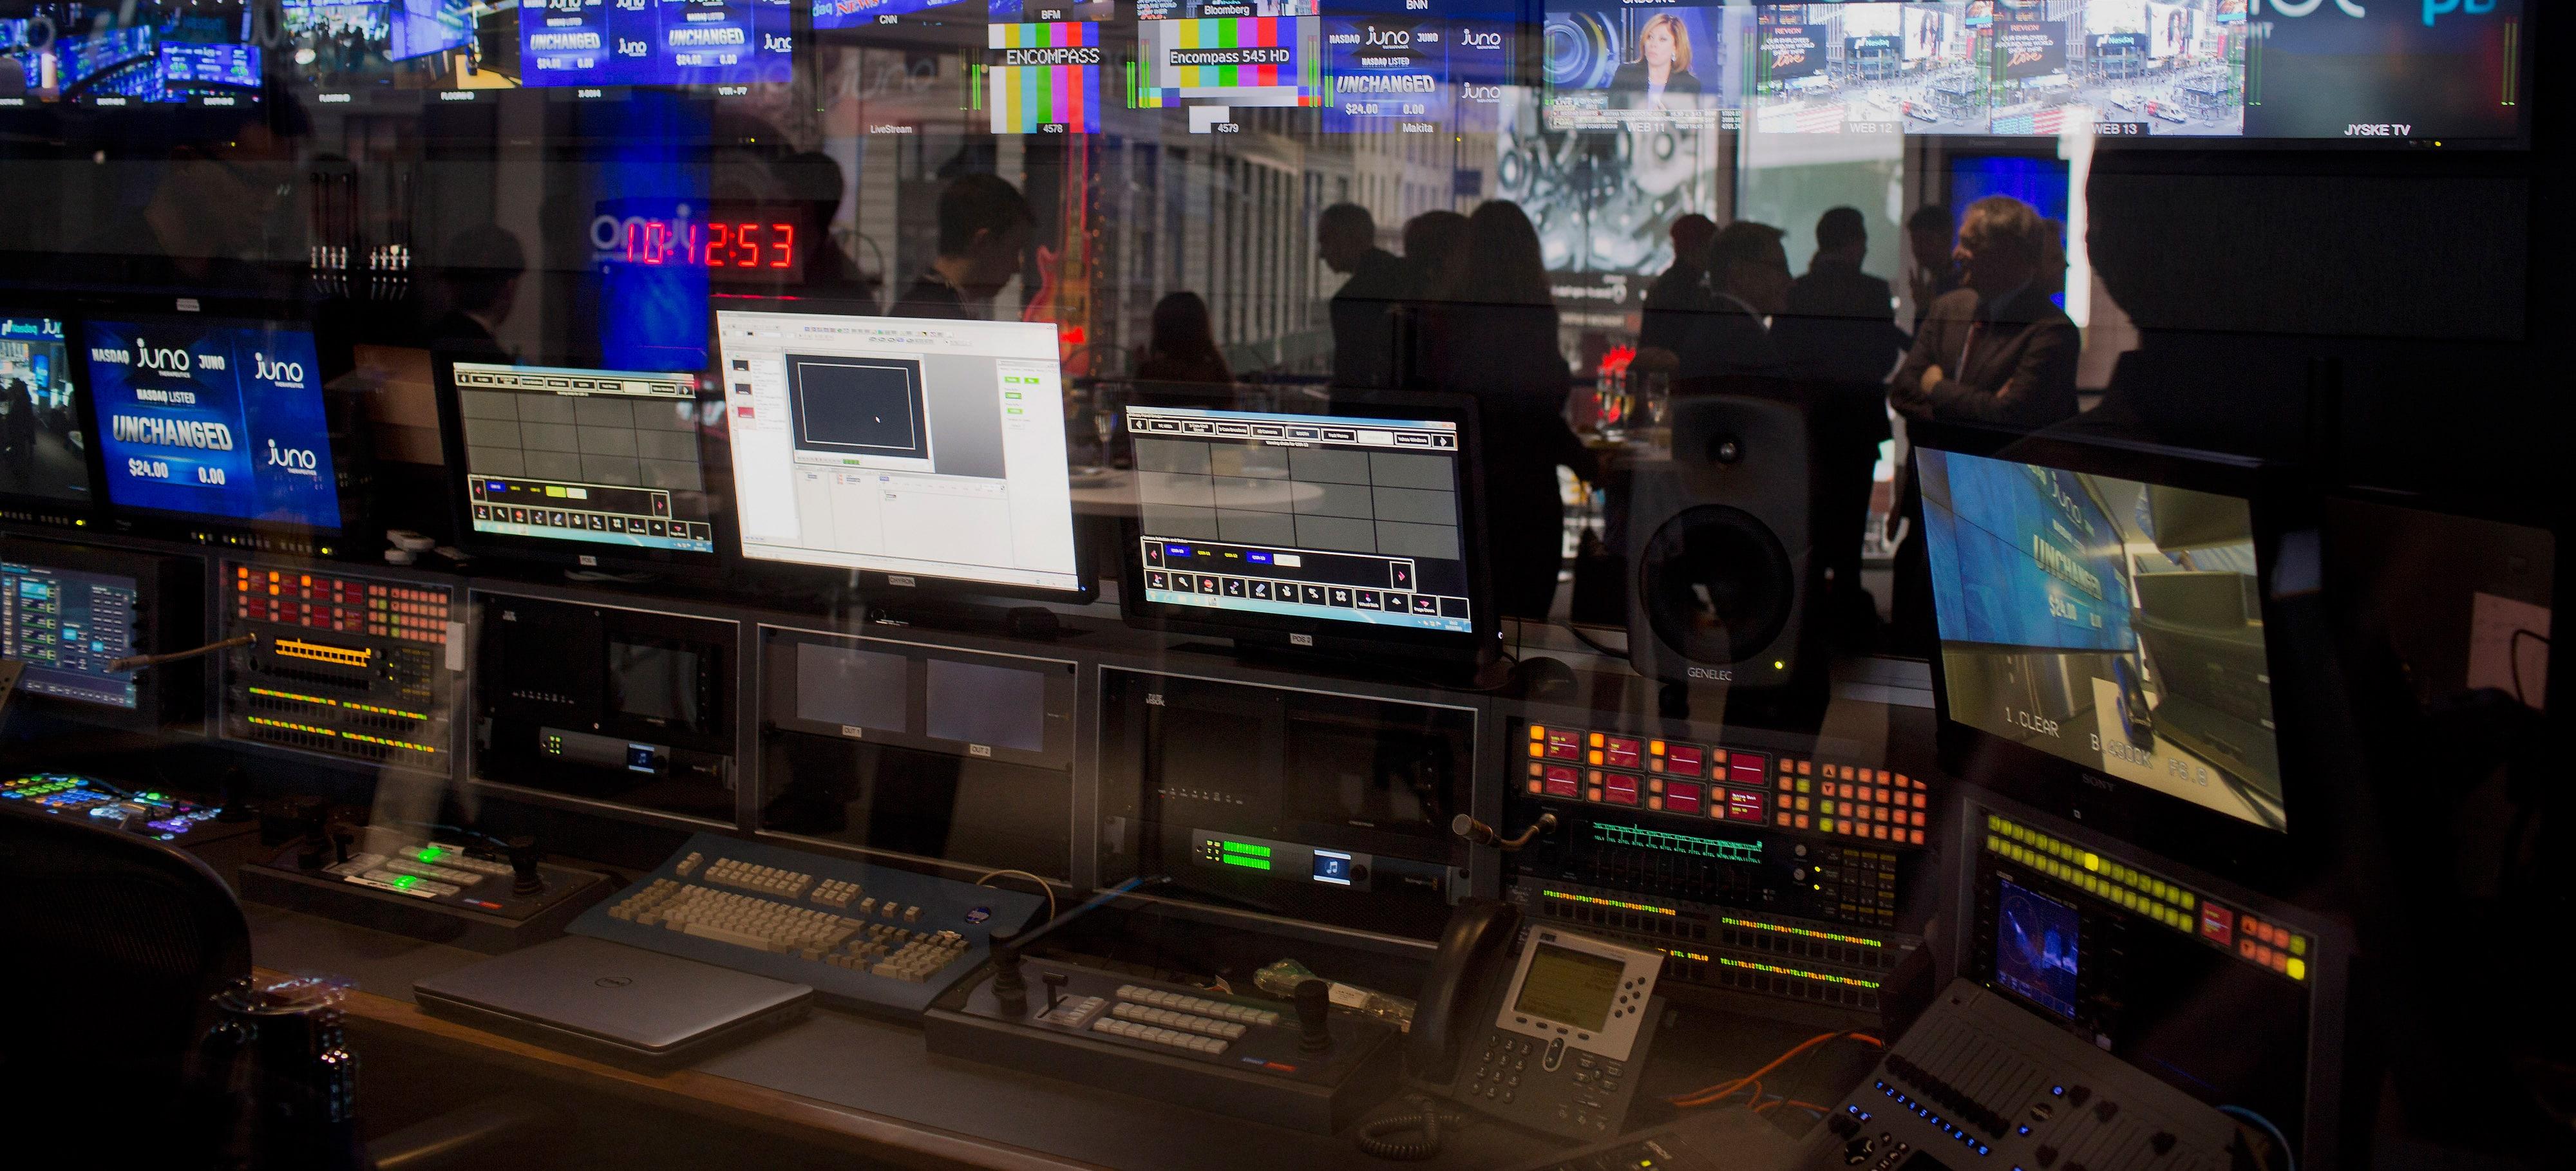 Overstock Intending to Issue Digital Securities in $500M SEC Filing